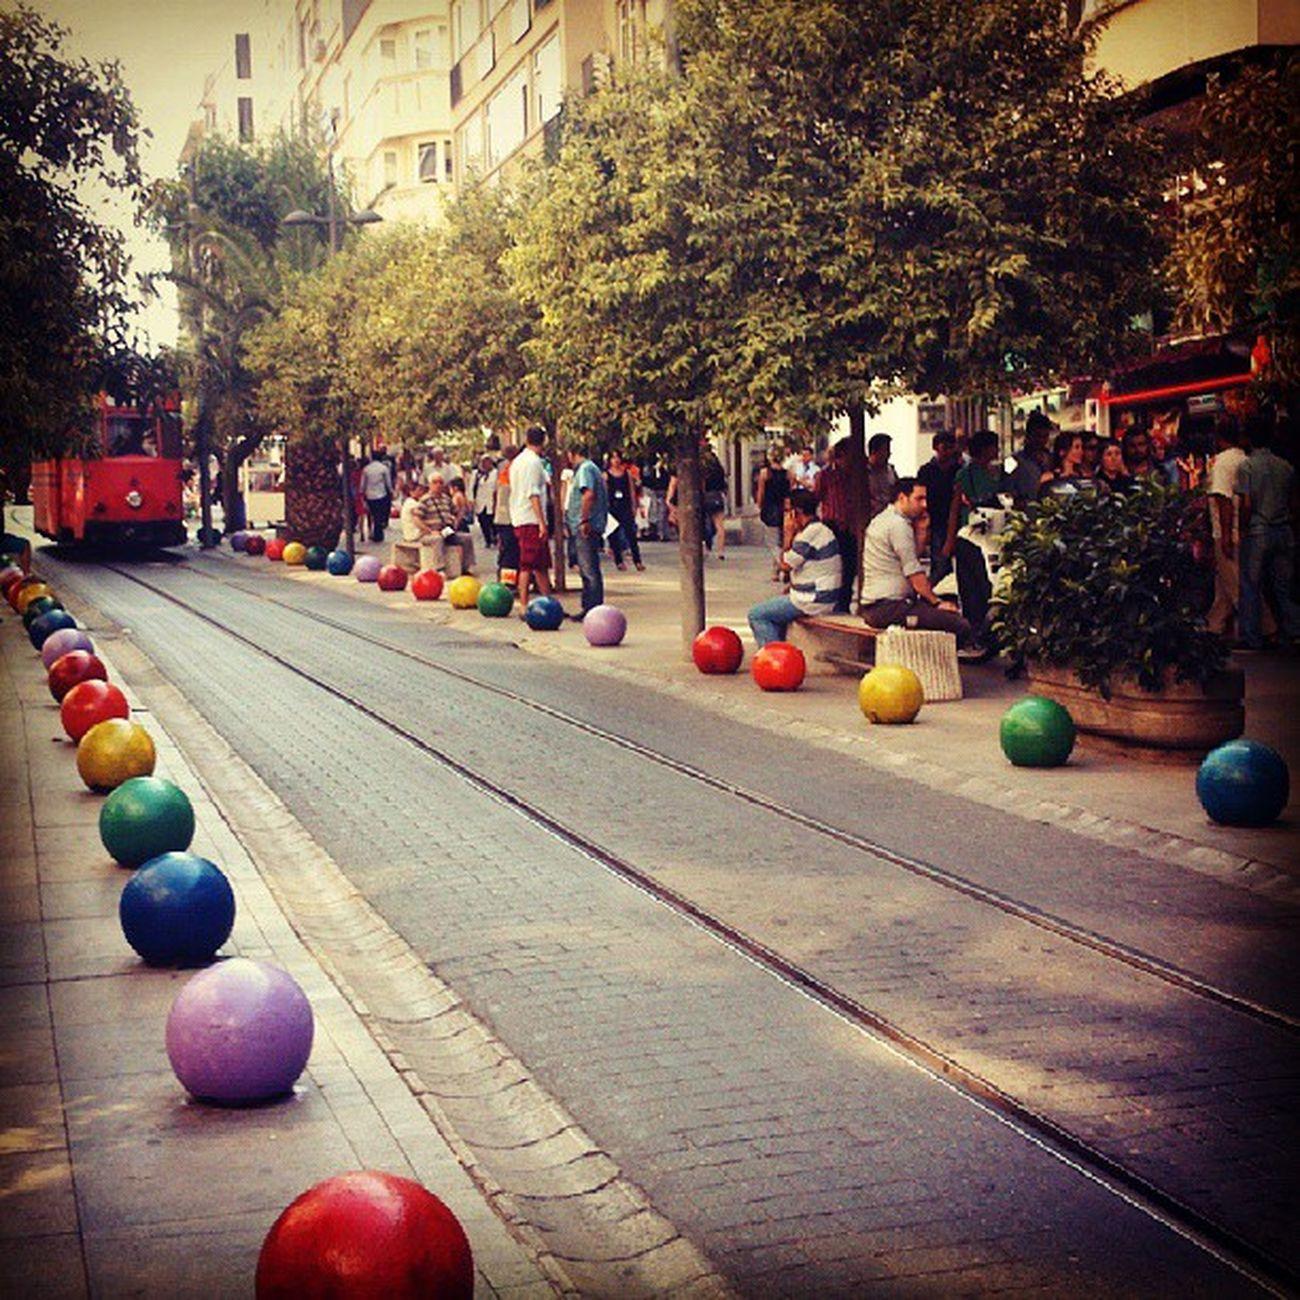 Direnmerdiven Kadikoy Bahariye Istanbul turkey colourful street thebestoftheday instaturkey landscape